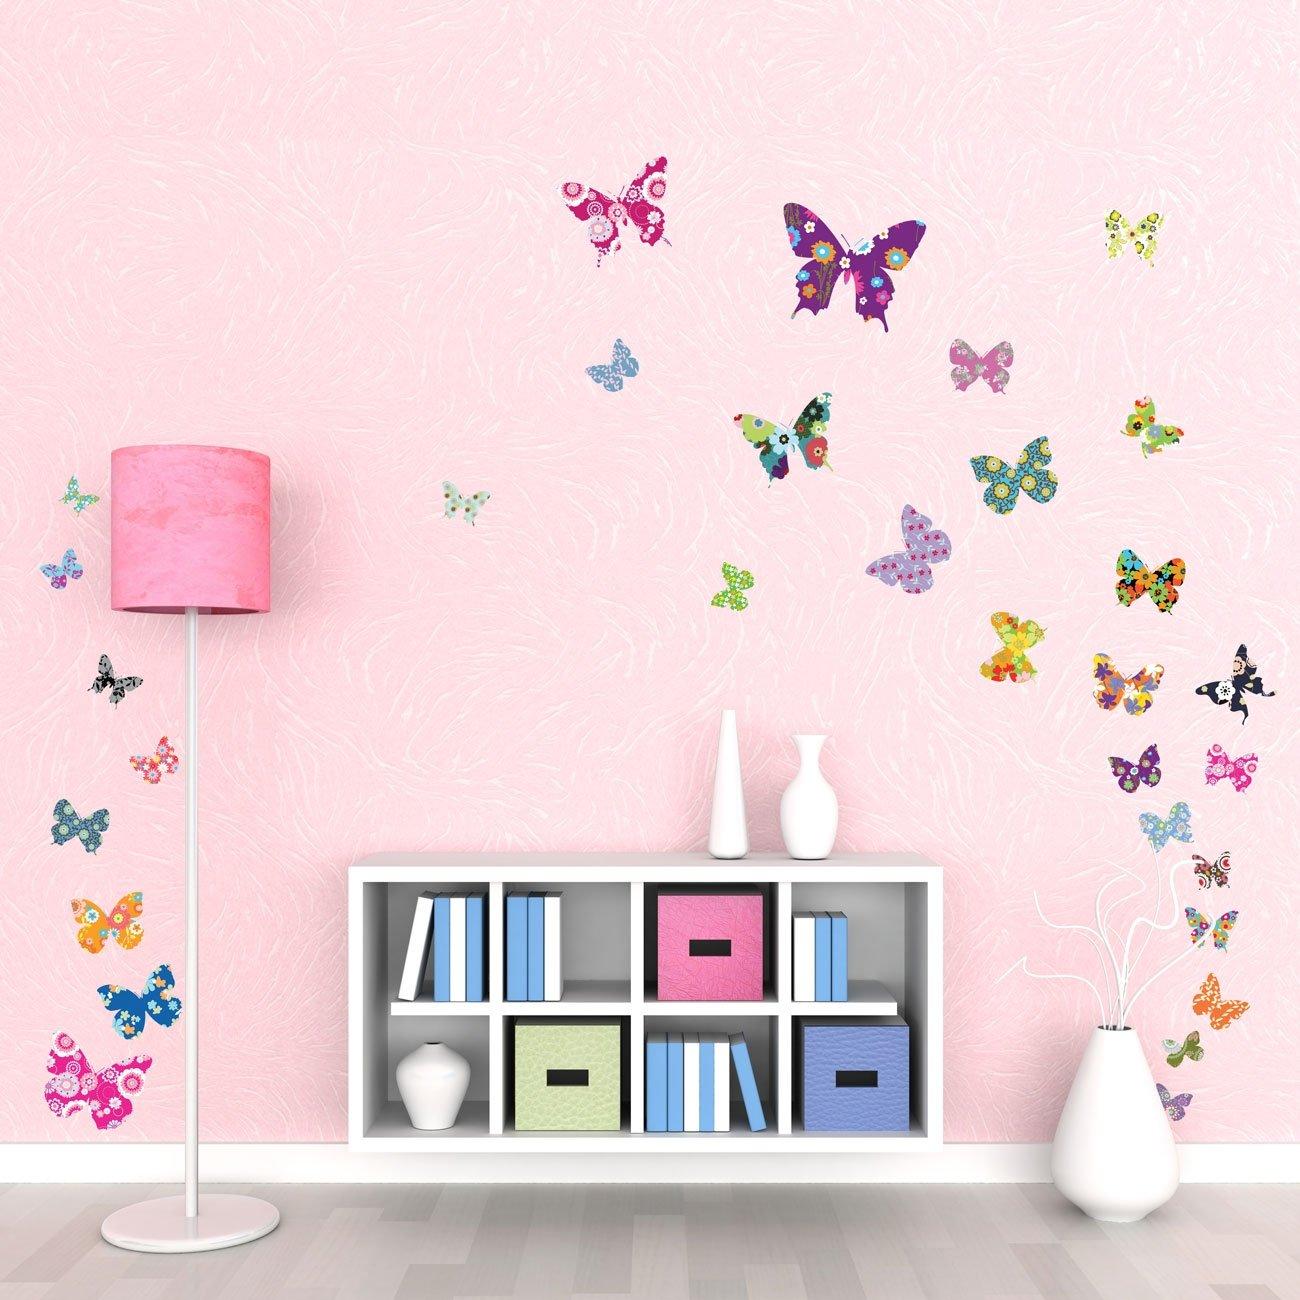 Amazon.com: Decowall DW-1201 38 Colourful Flower Butterflies Kids ...